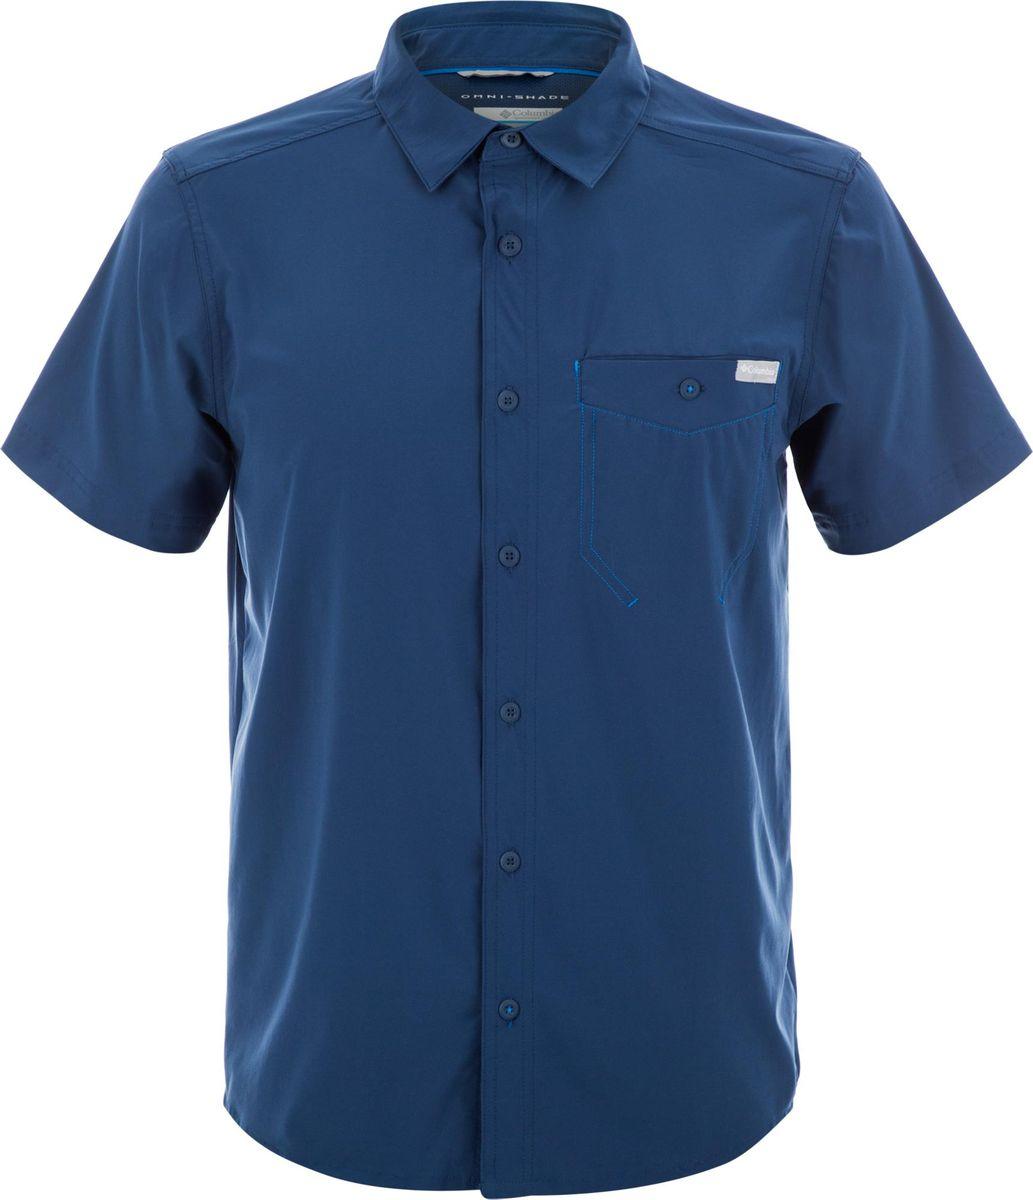 Рубашка Columbia Triple Canyon Solid Short Sleeve Shirt рубашка мужская columbia katchor ii short sleeve shirt цвет голубой 1577778 440 размер xl 52 54